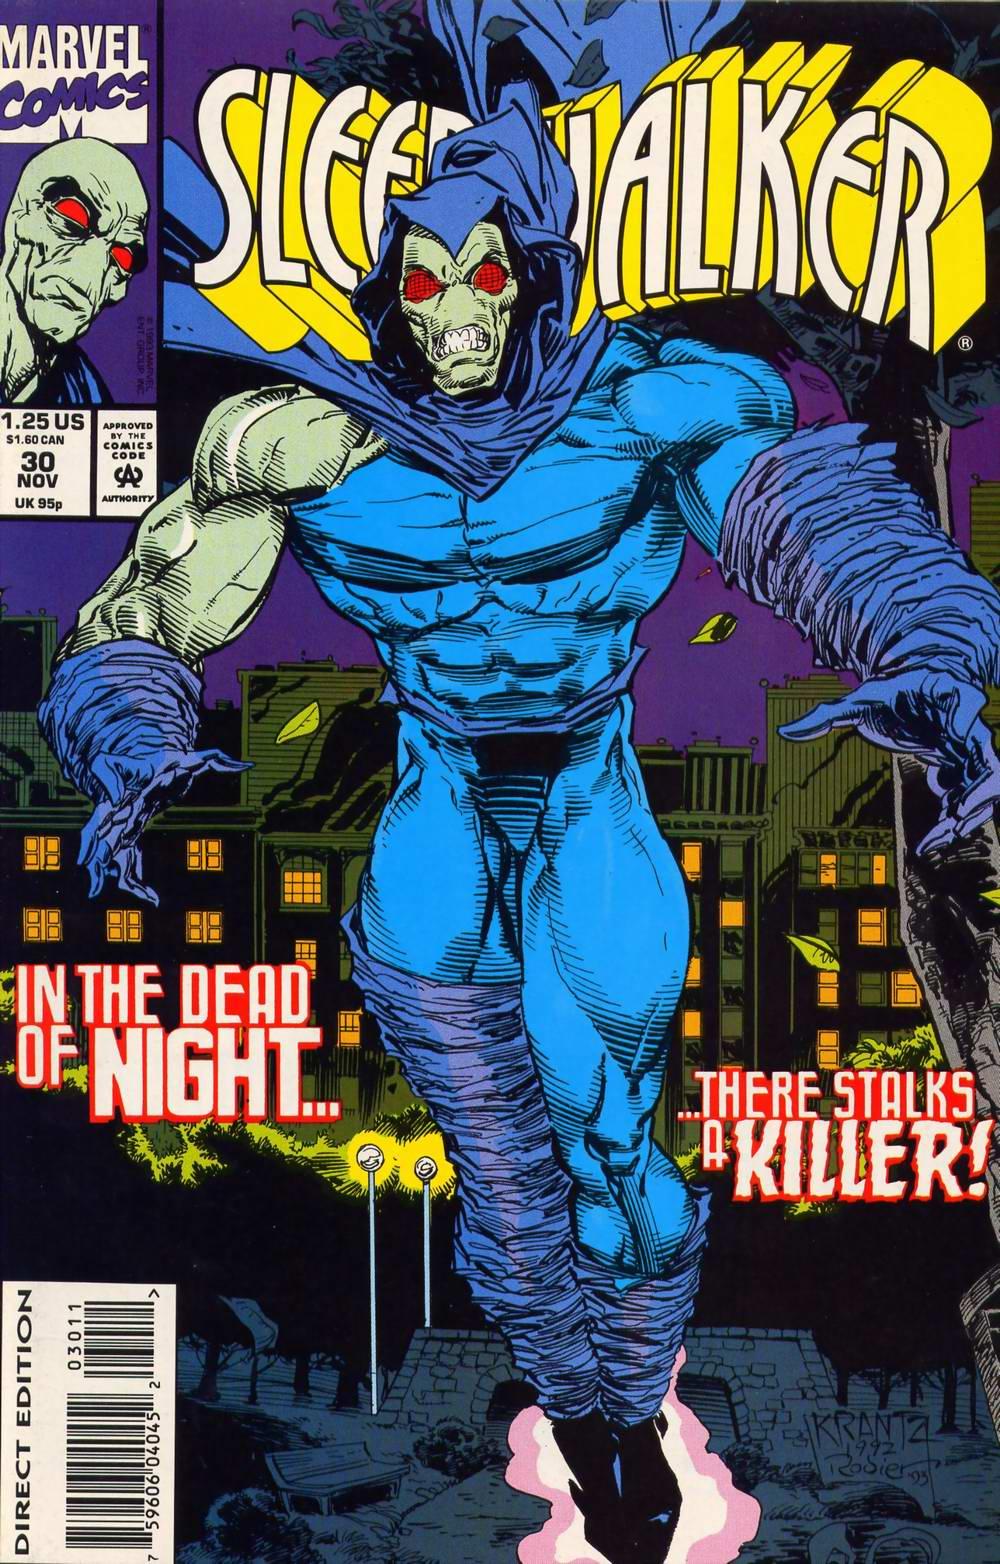 Read online Sleepwalker comic -  Issue #30 - 1